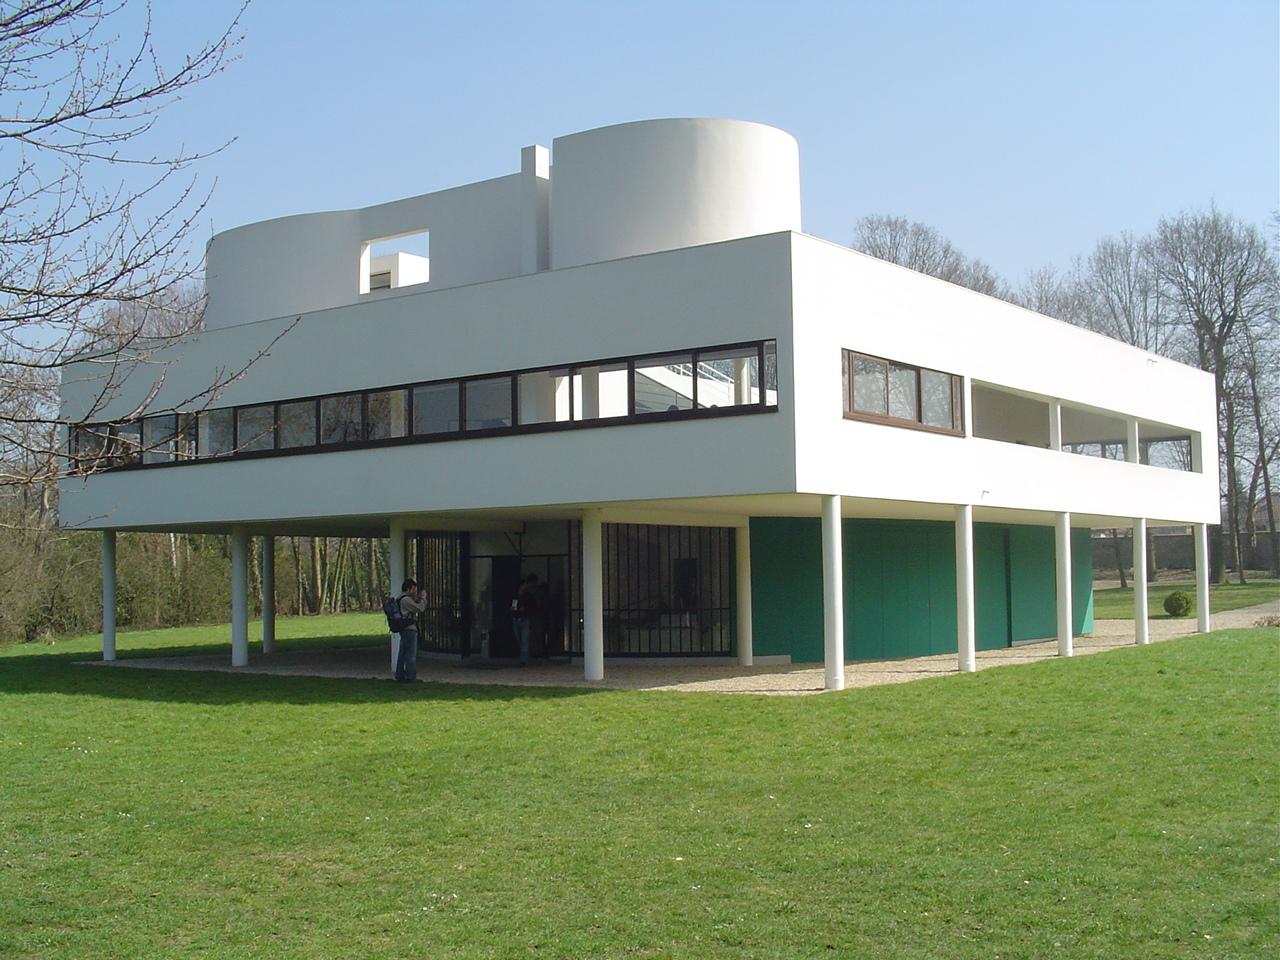 Legennings architecture the villa savoye le corbusier - Le corbusier villa savoye ...